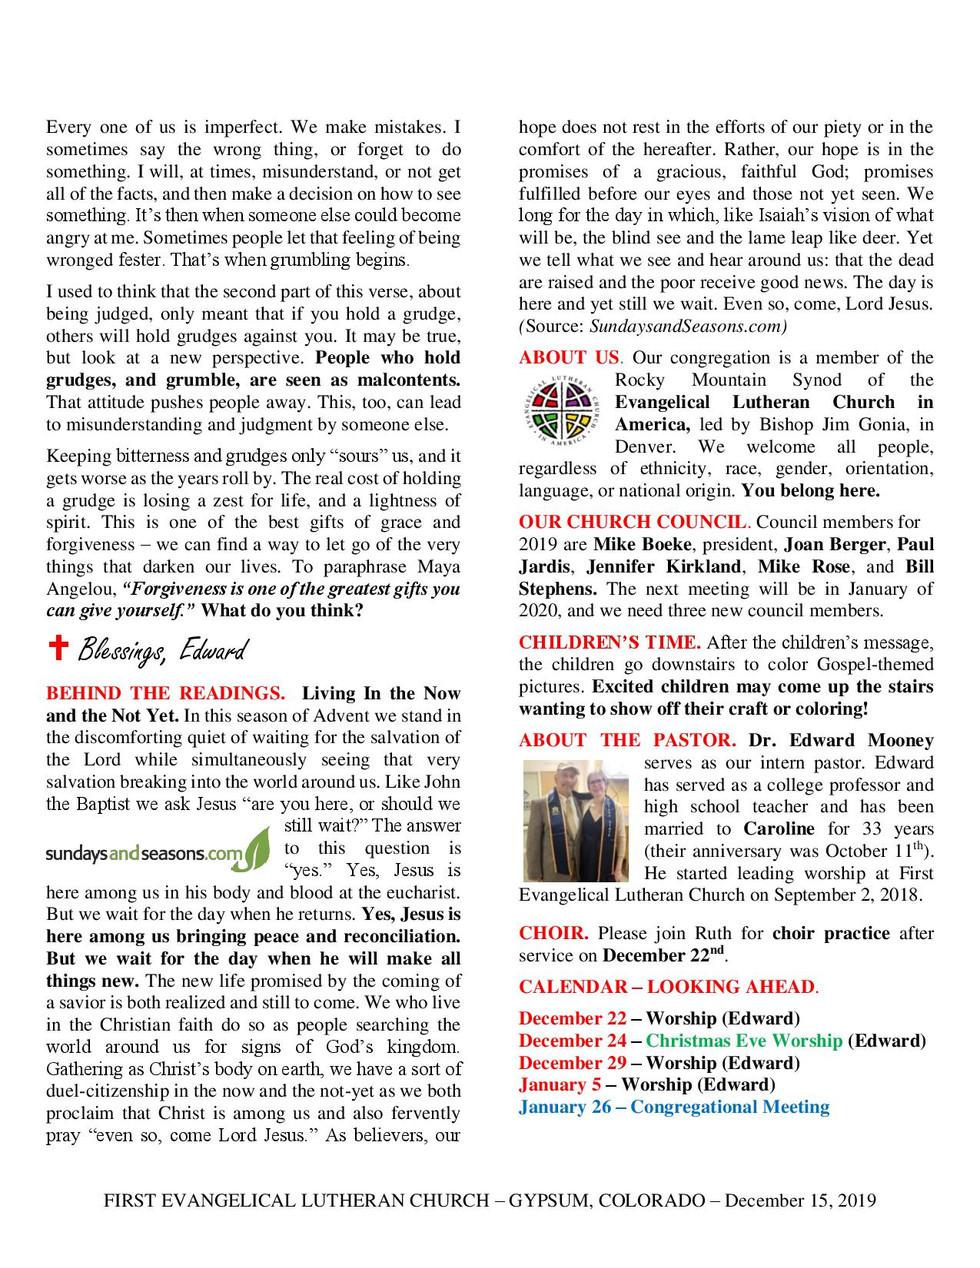 Newsletter, December 15, 2019, page 2